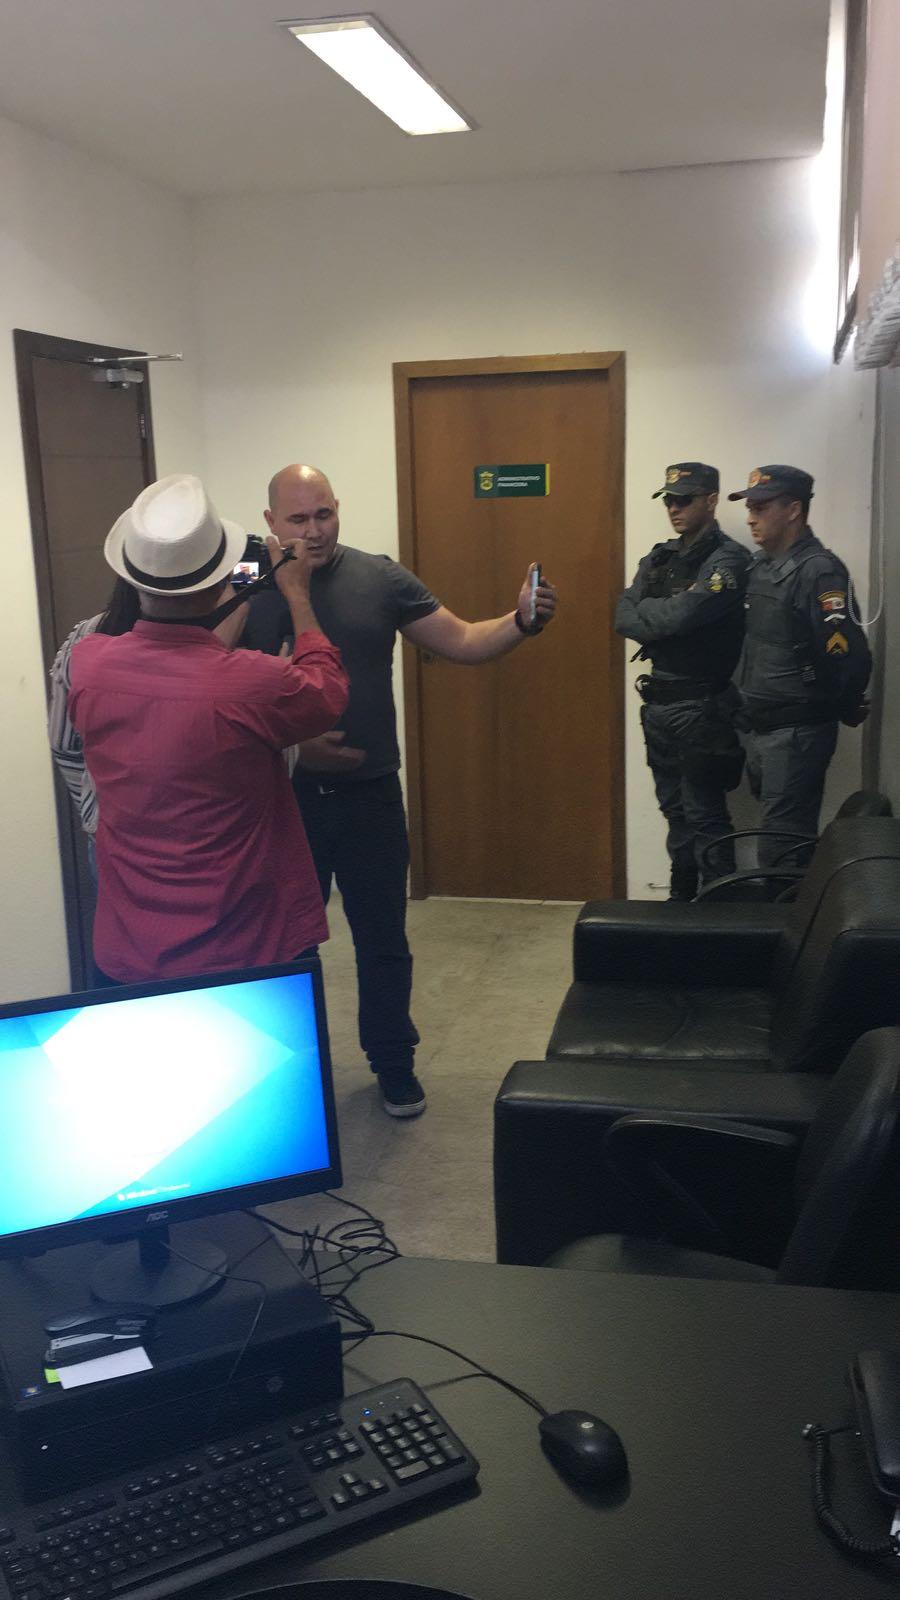 Vereador provoca tumulto em secretaria e intimida servidores públicos